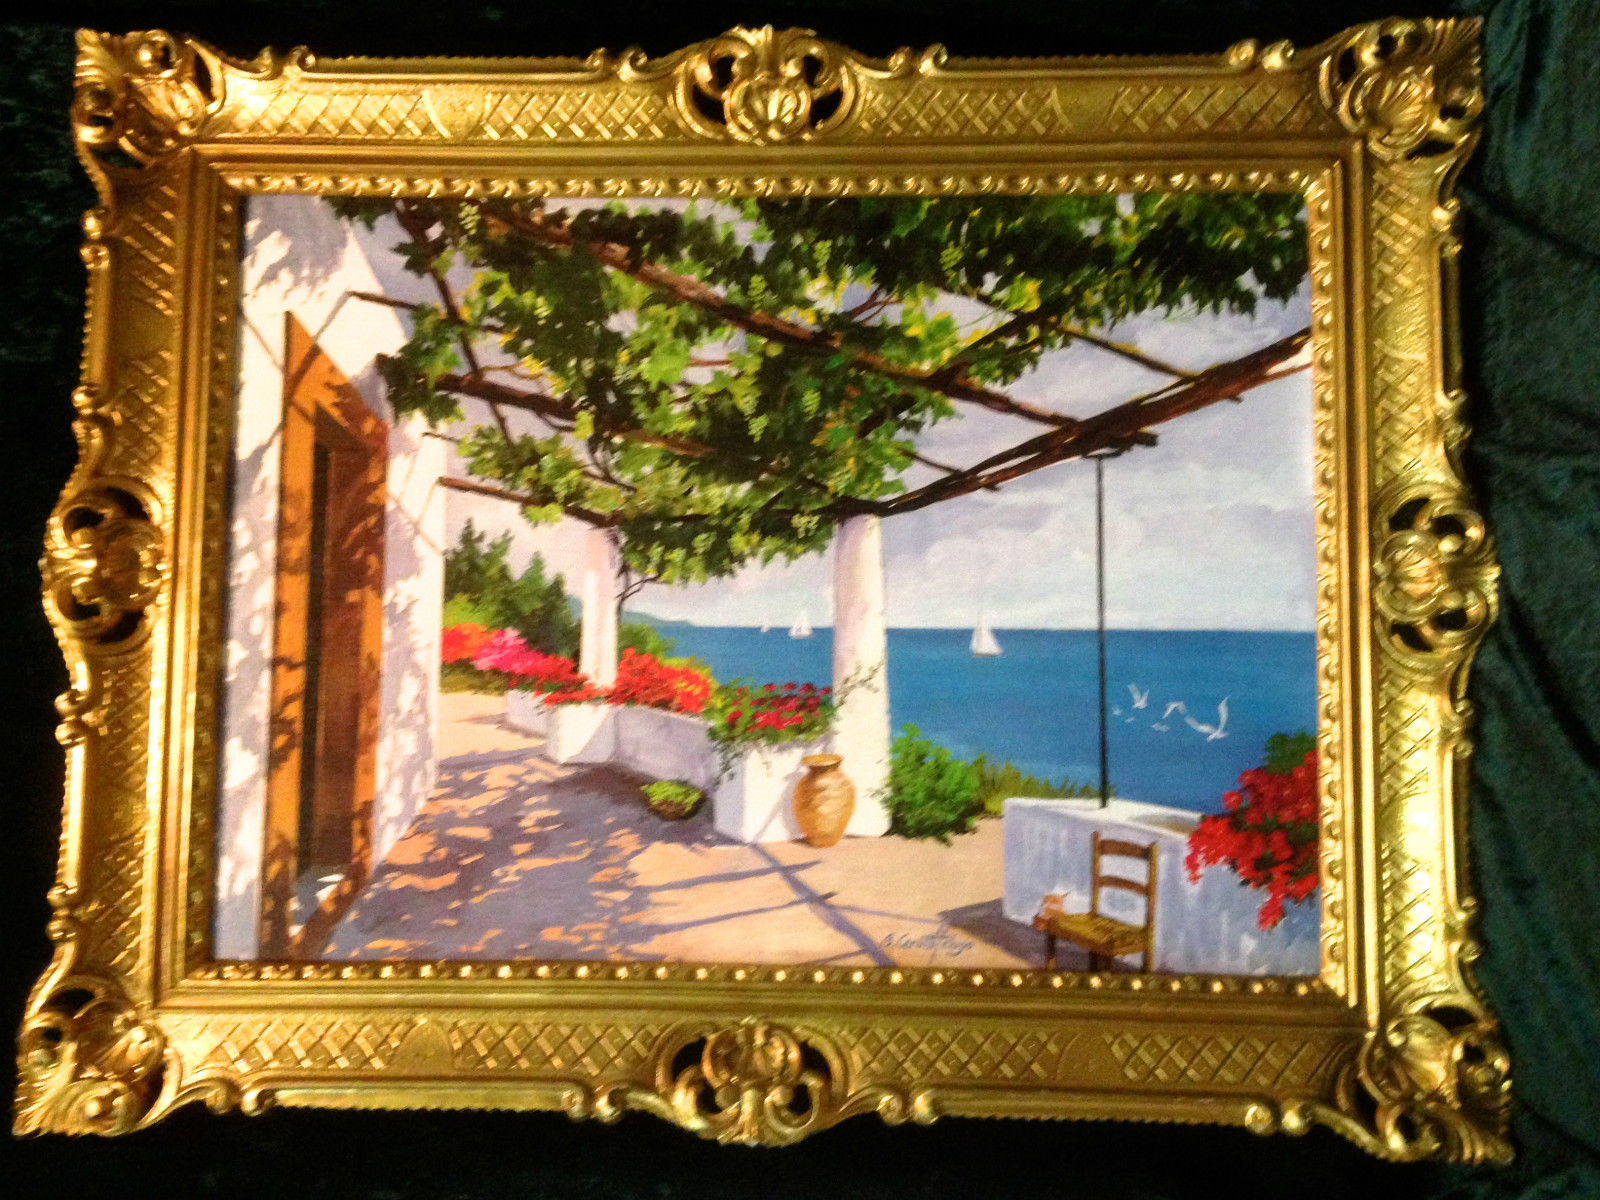 Gemälde Antik Haus am See Blume Reblikat Bild mit Rahmen 90X70 ...